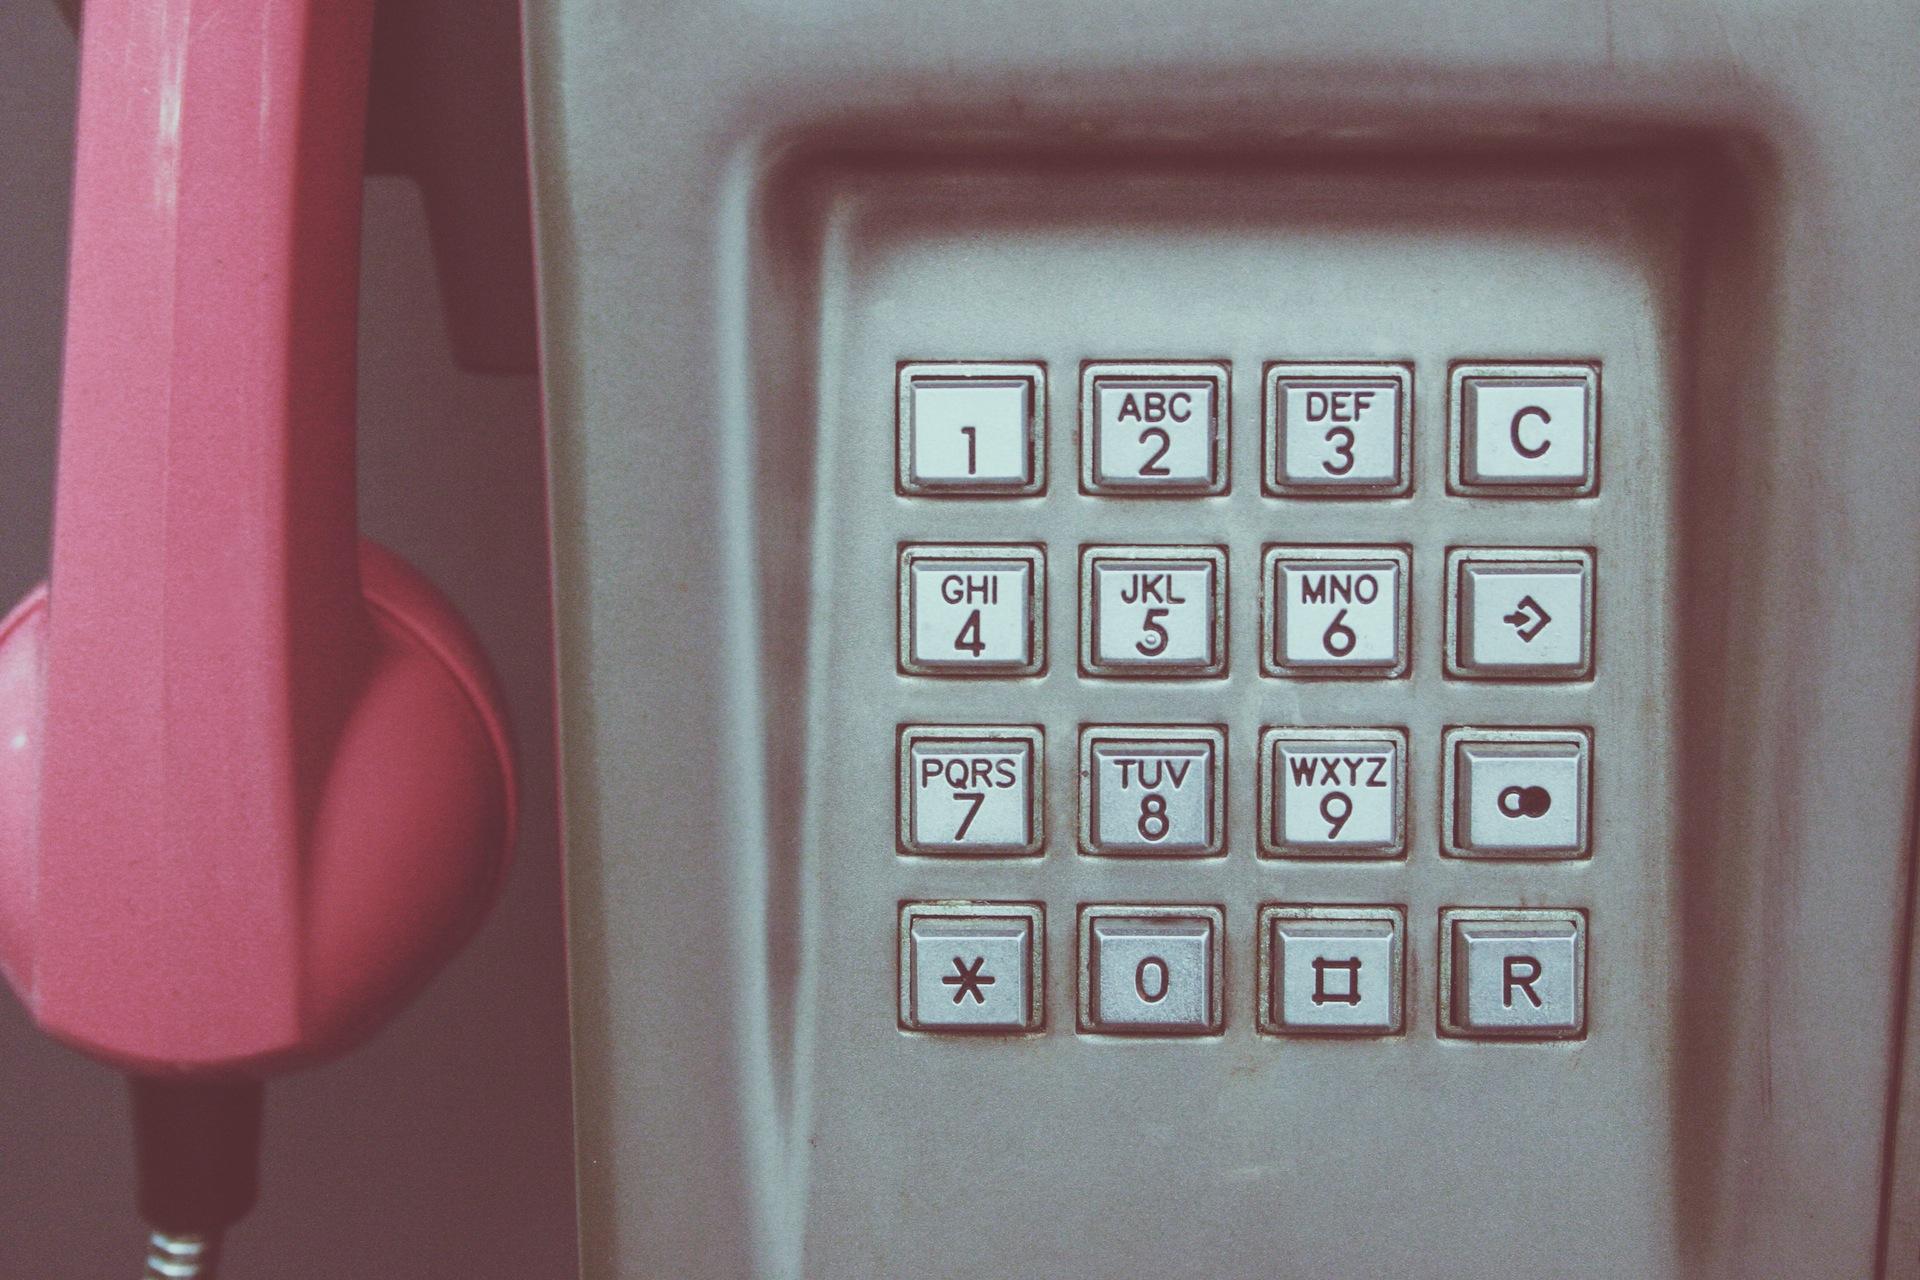 teléfono, cabina, teclas, números, vintage, retro, cabina telefónica - Fondos de Pantalla HD - professor-falken.com